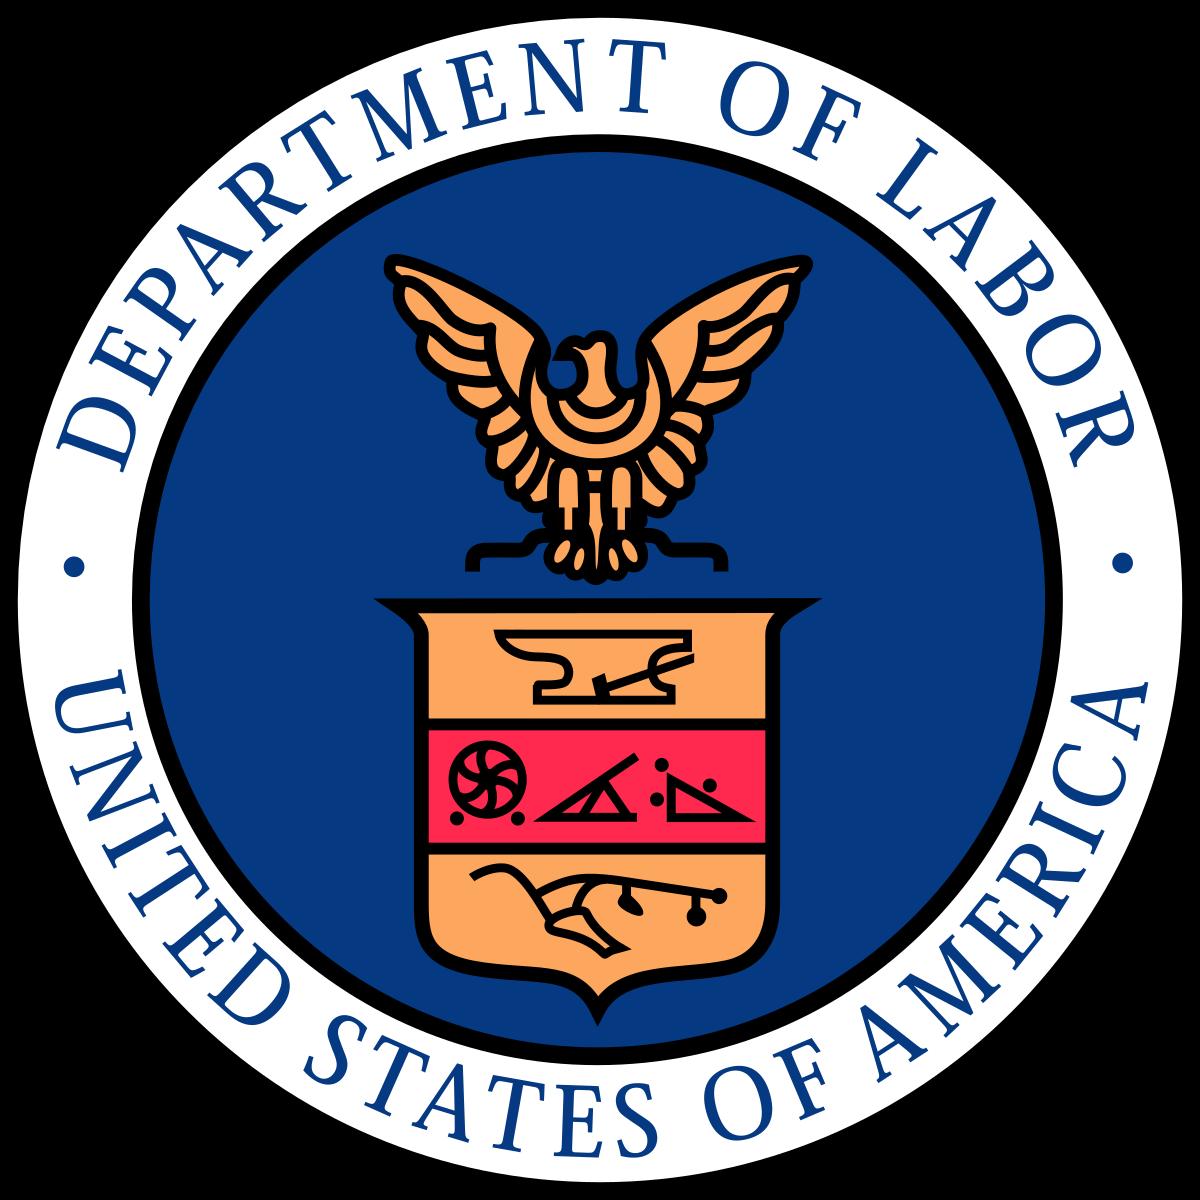 Plumbing Registered Apprenticeship